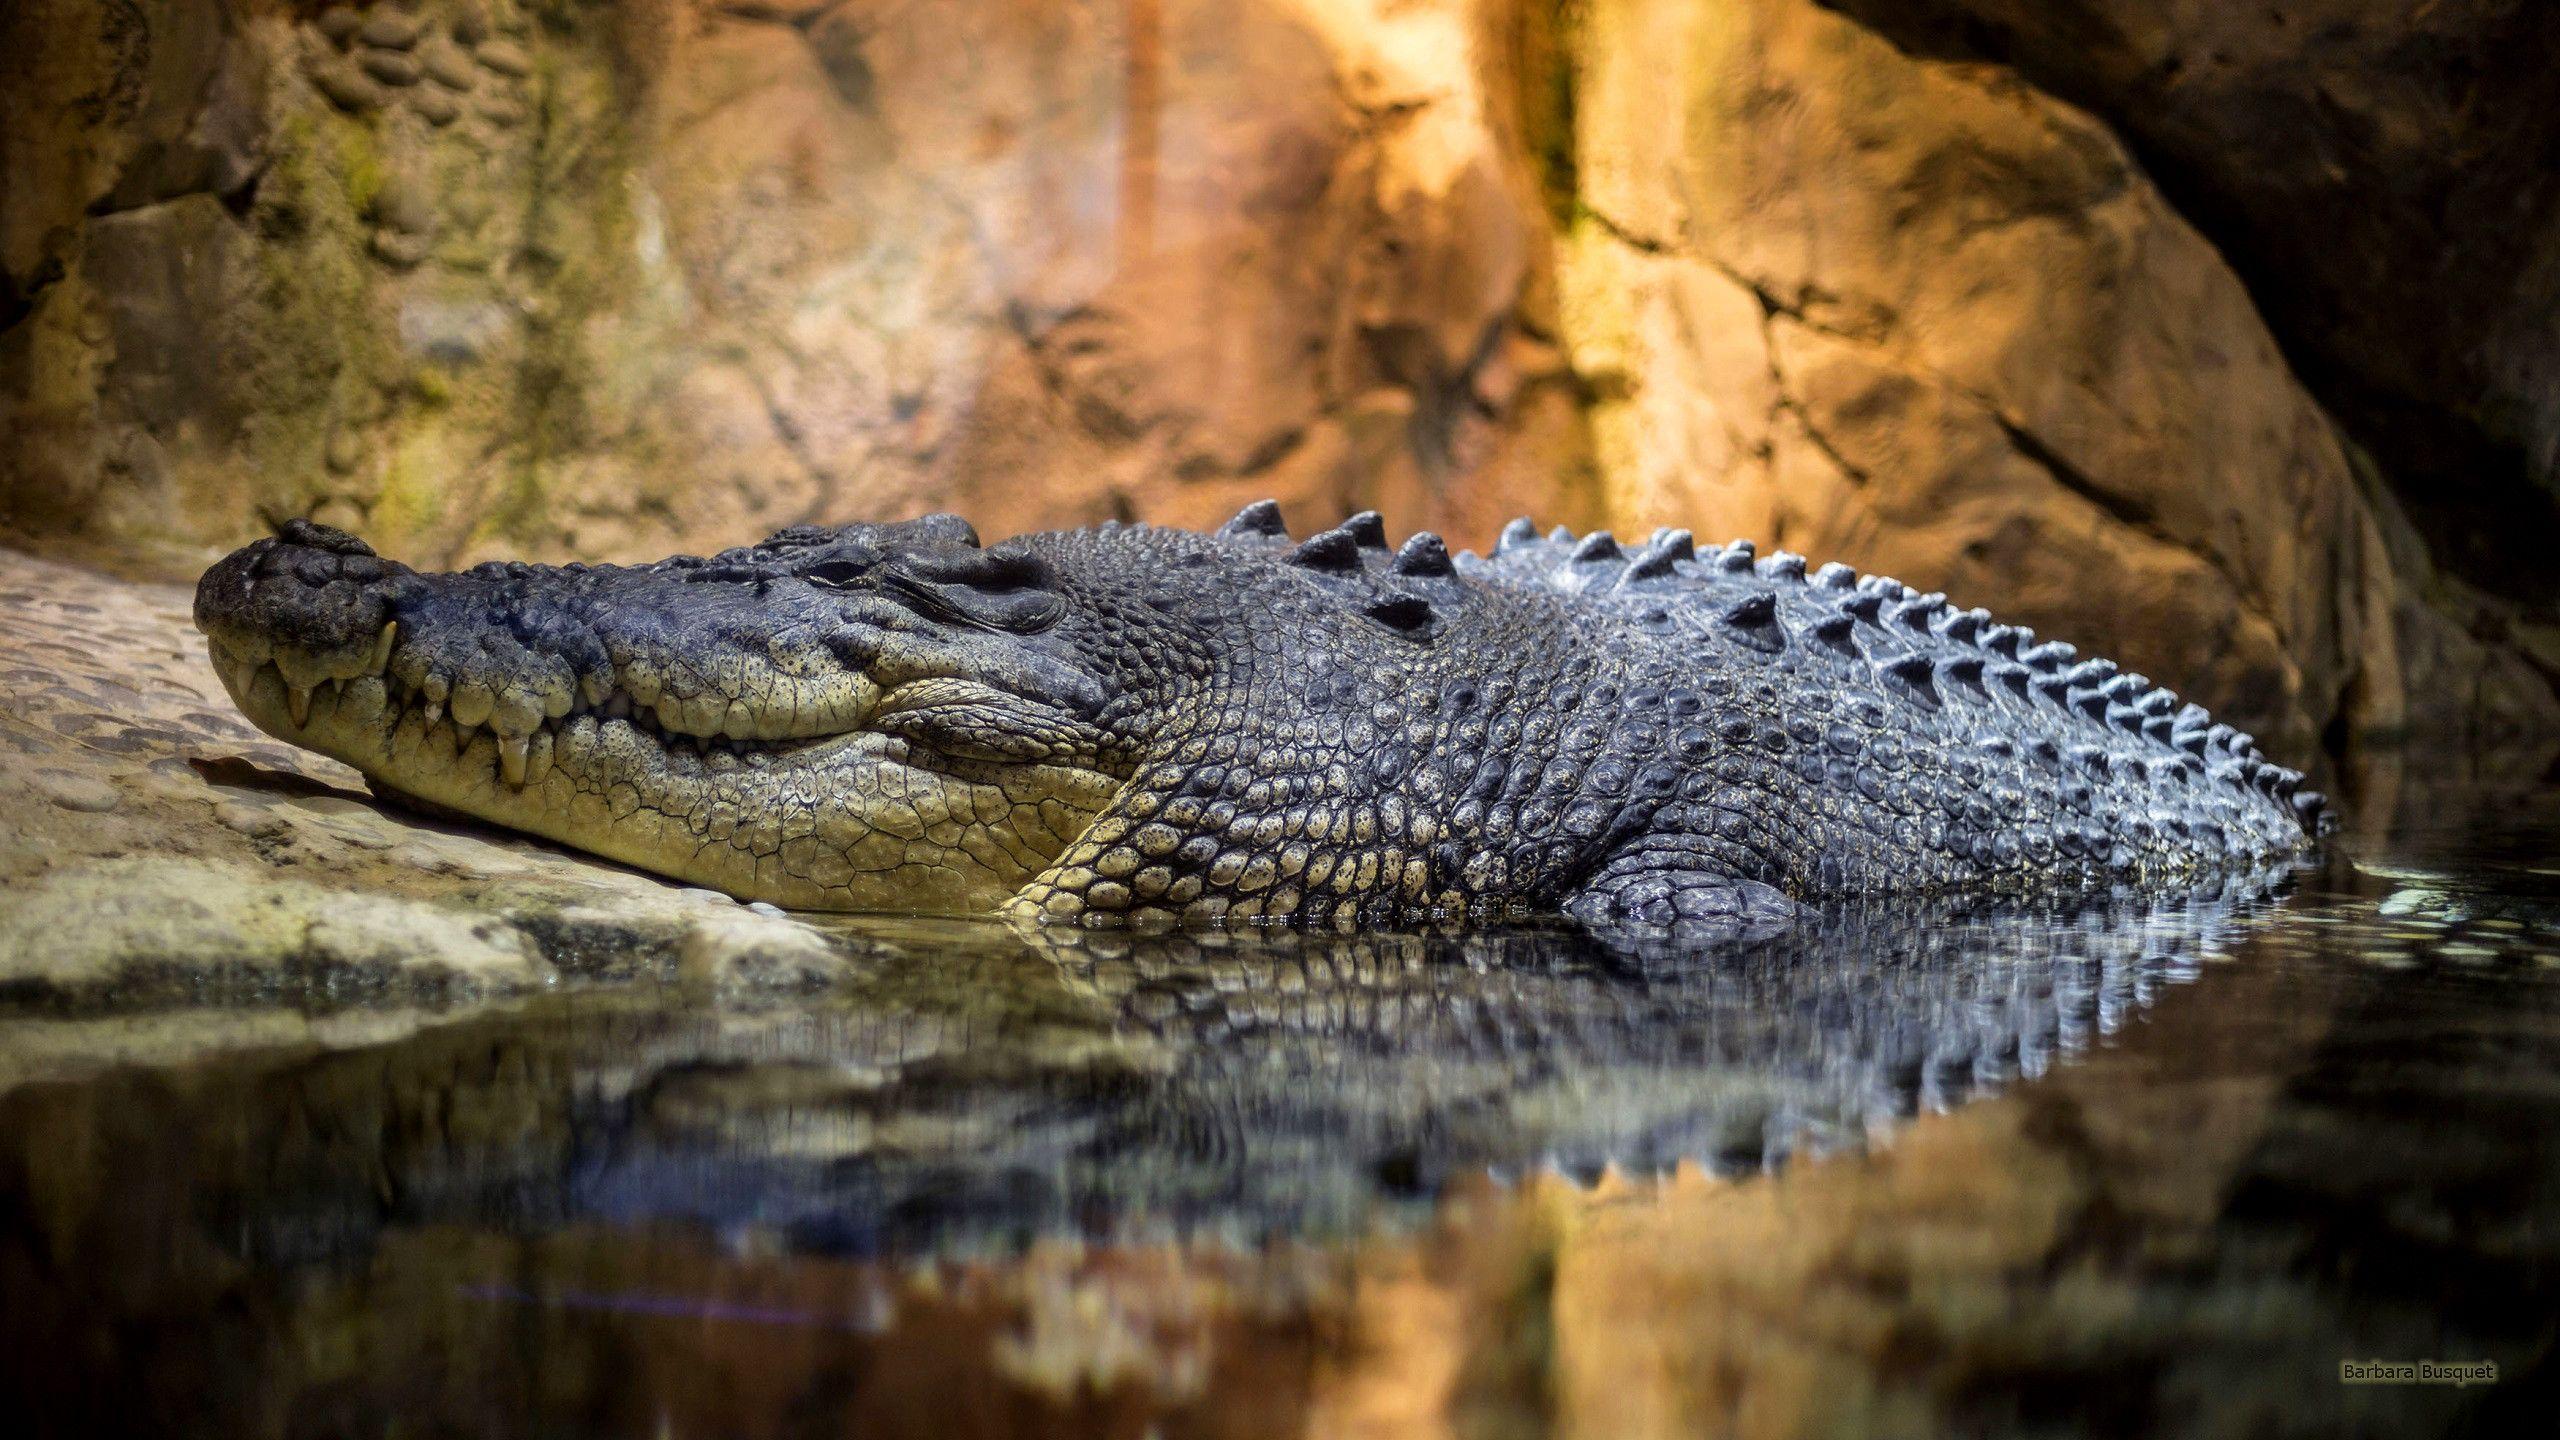 Crocodiles Wallpapers - Wallpaper Cave